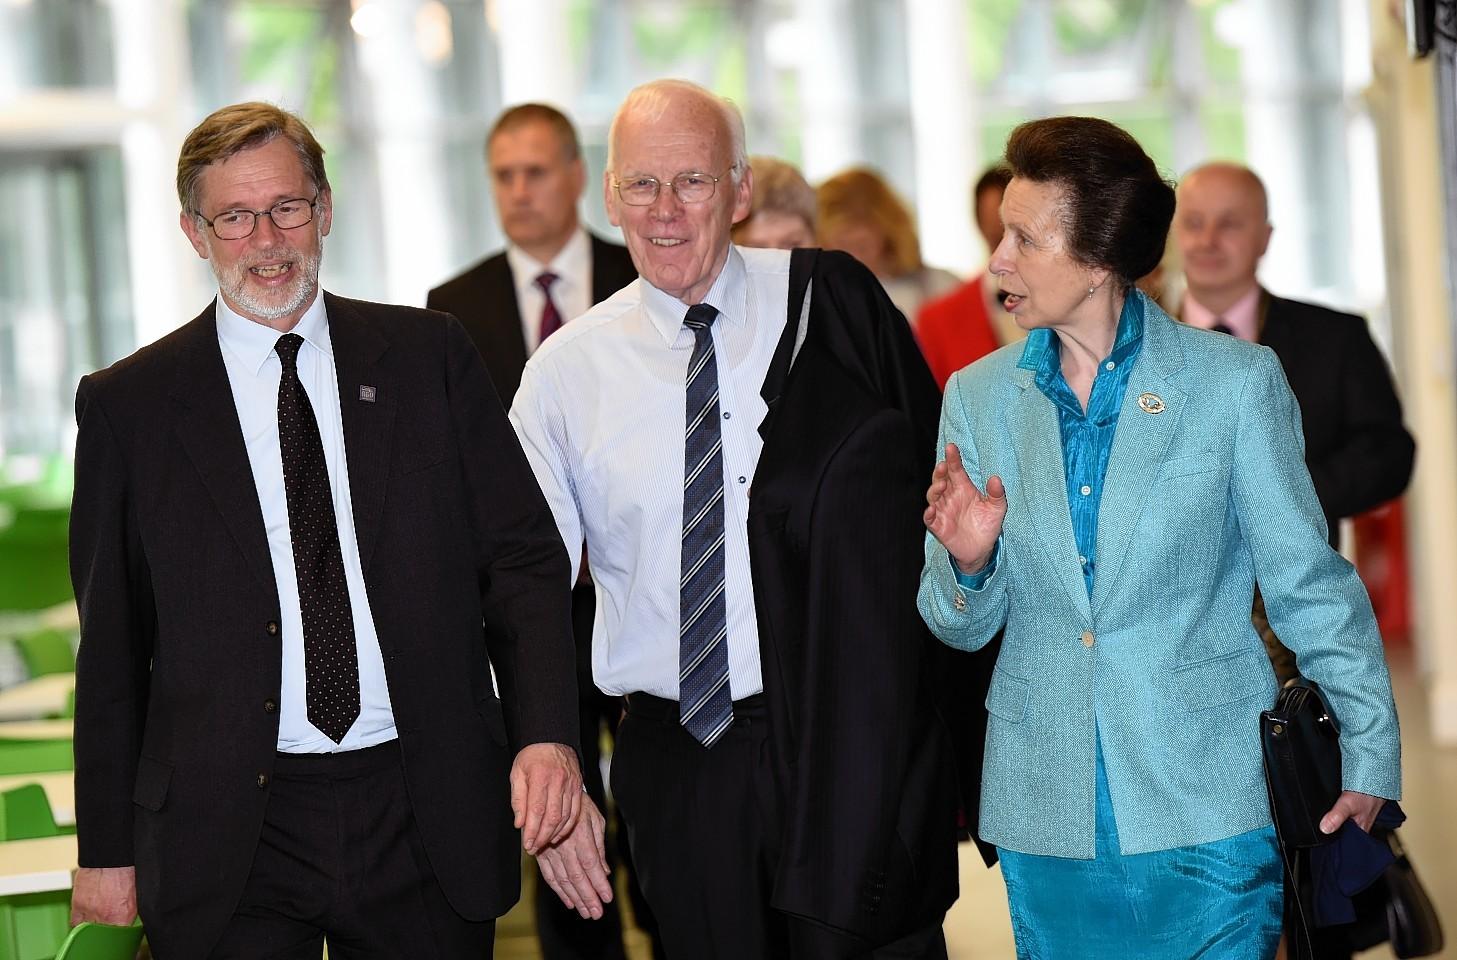 Princess Anne with Prof Ferdinand von Prondzynski and Sir Ian Wood.  Picture by Kami Thomson